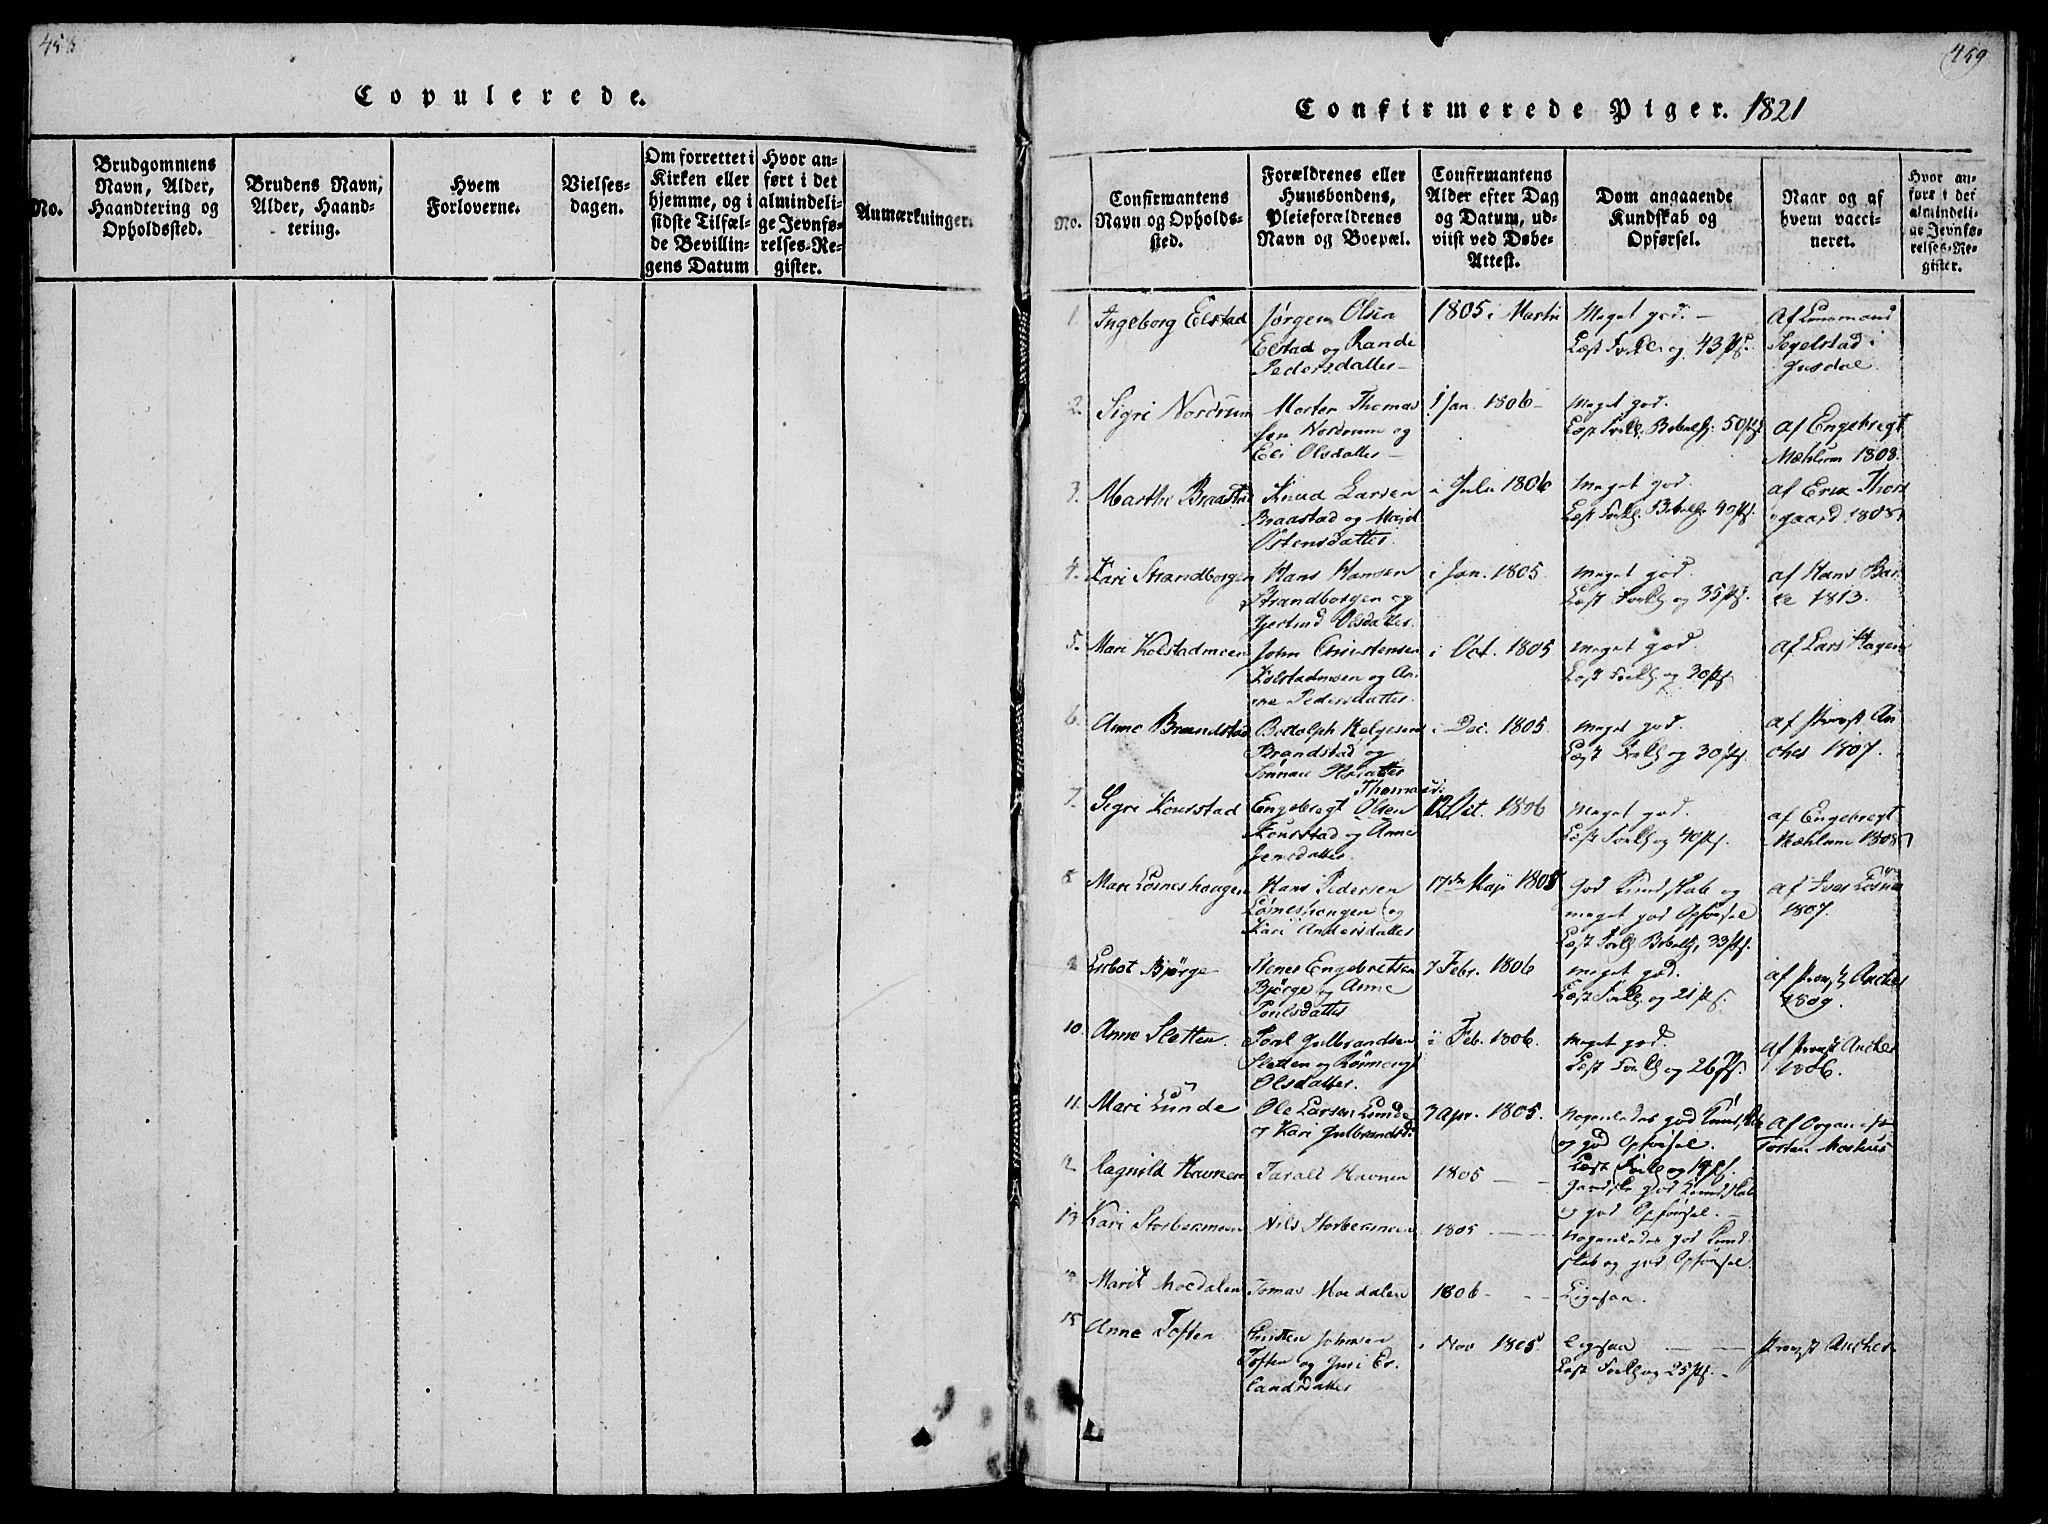 SAH, Ringebu prestekontor, Ministerialbok nr. 4, 1821-1839, s. 458-459